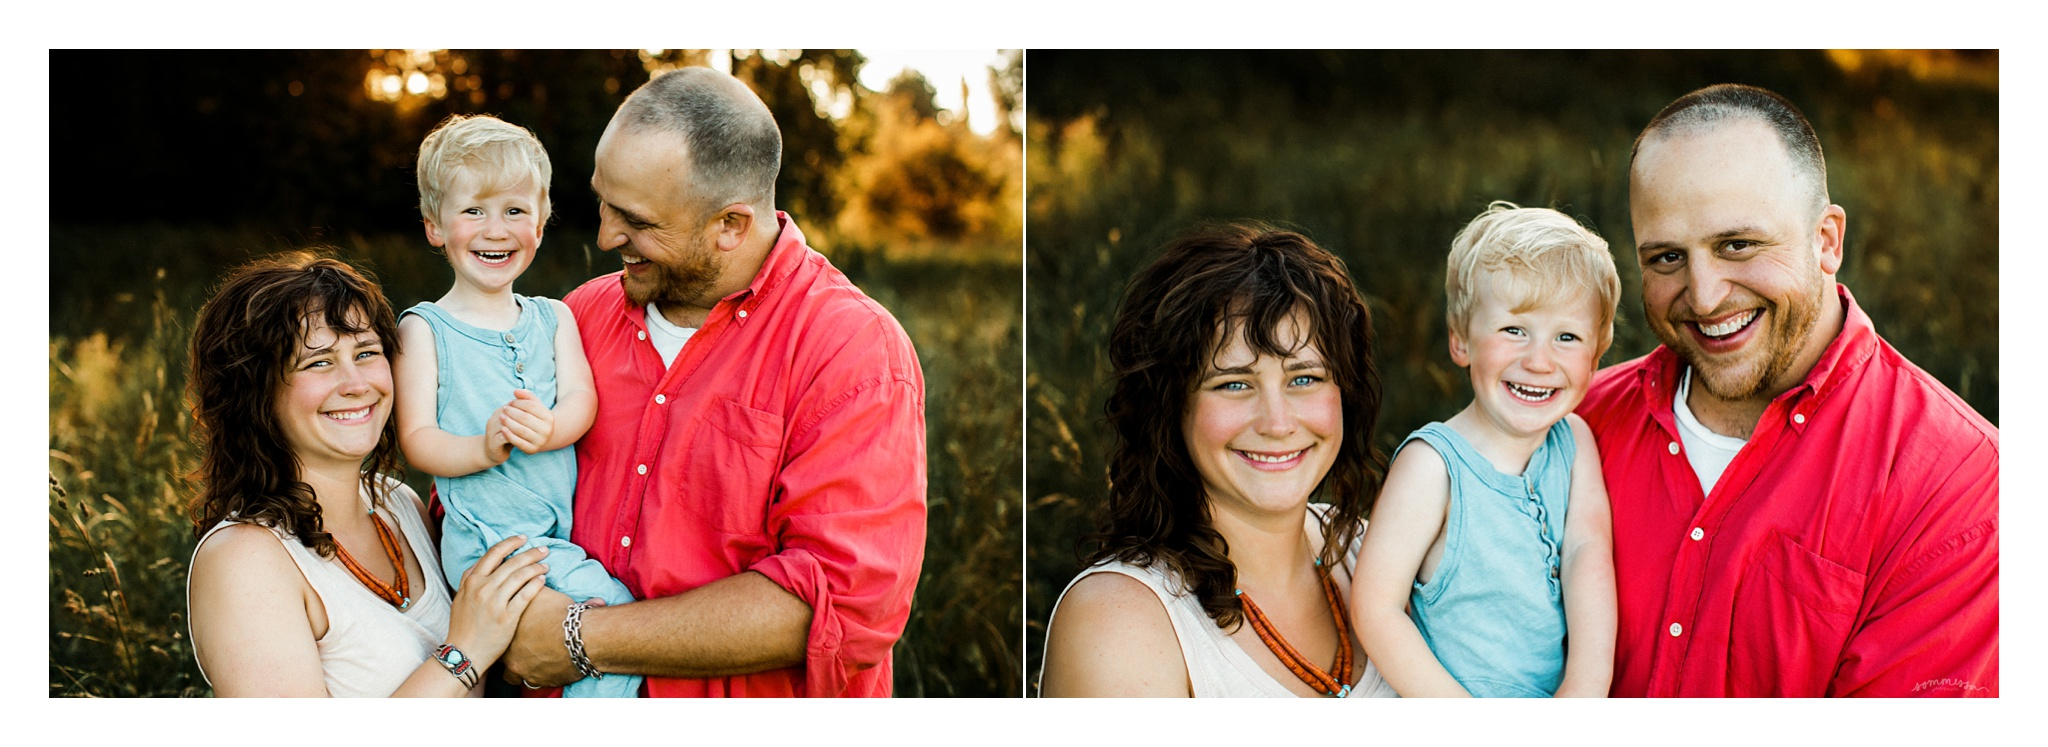 Family Photographer in Portland, Oregon_3105.jpg